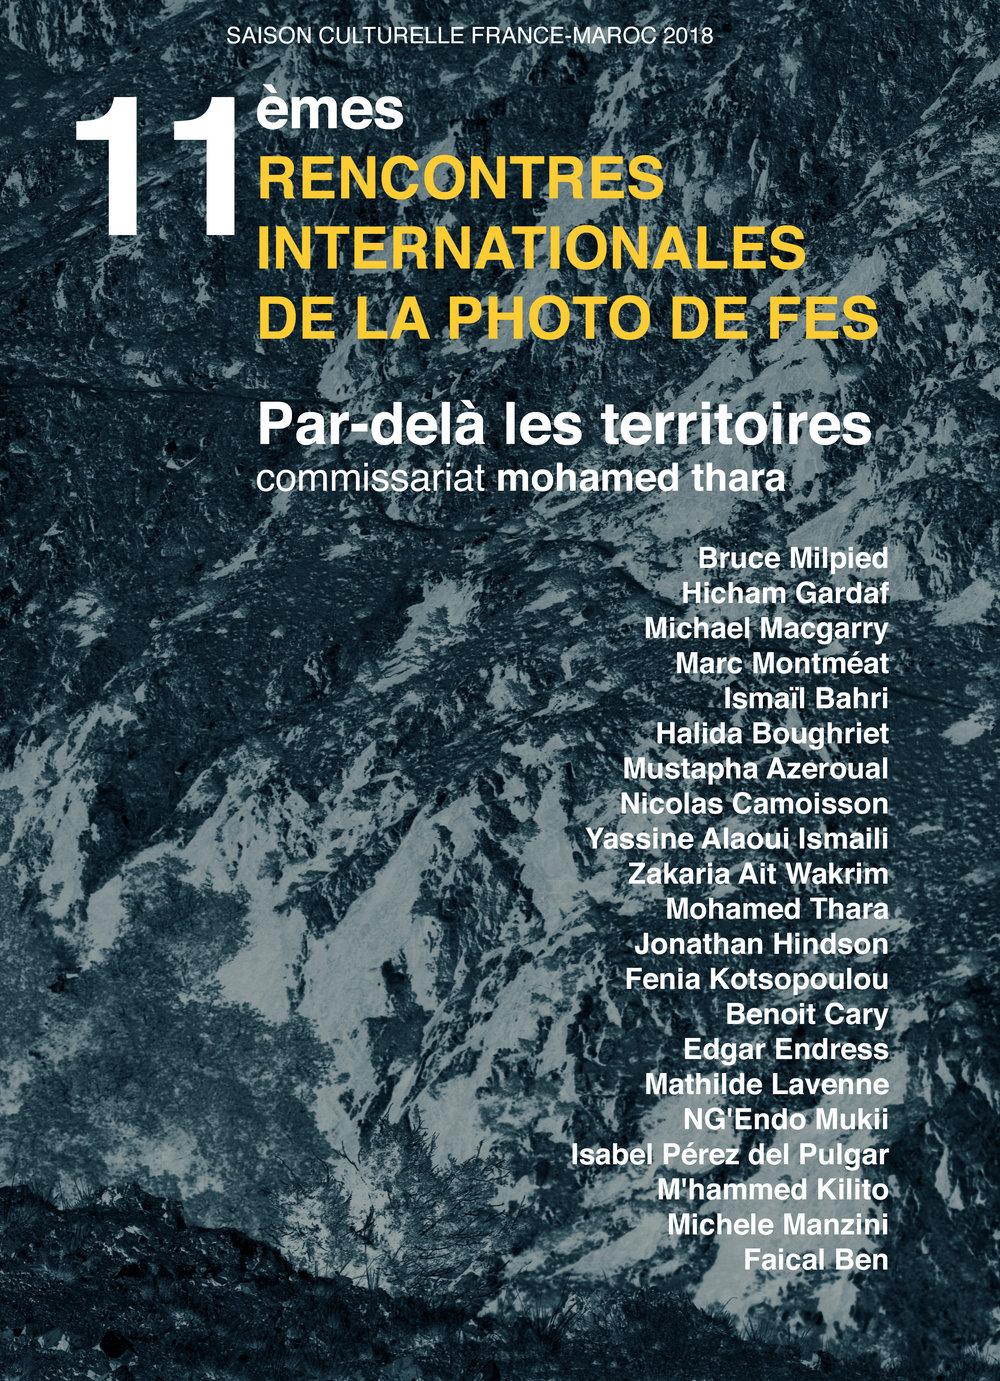 11 Rencontres Internationales de la photo de Fes Mohamed Thara.jpg